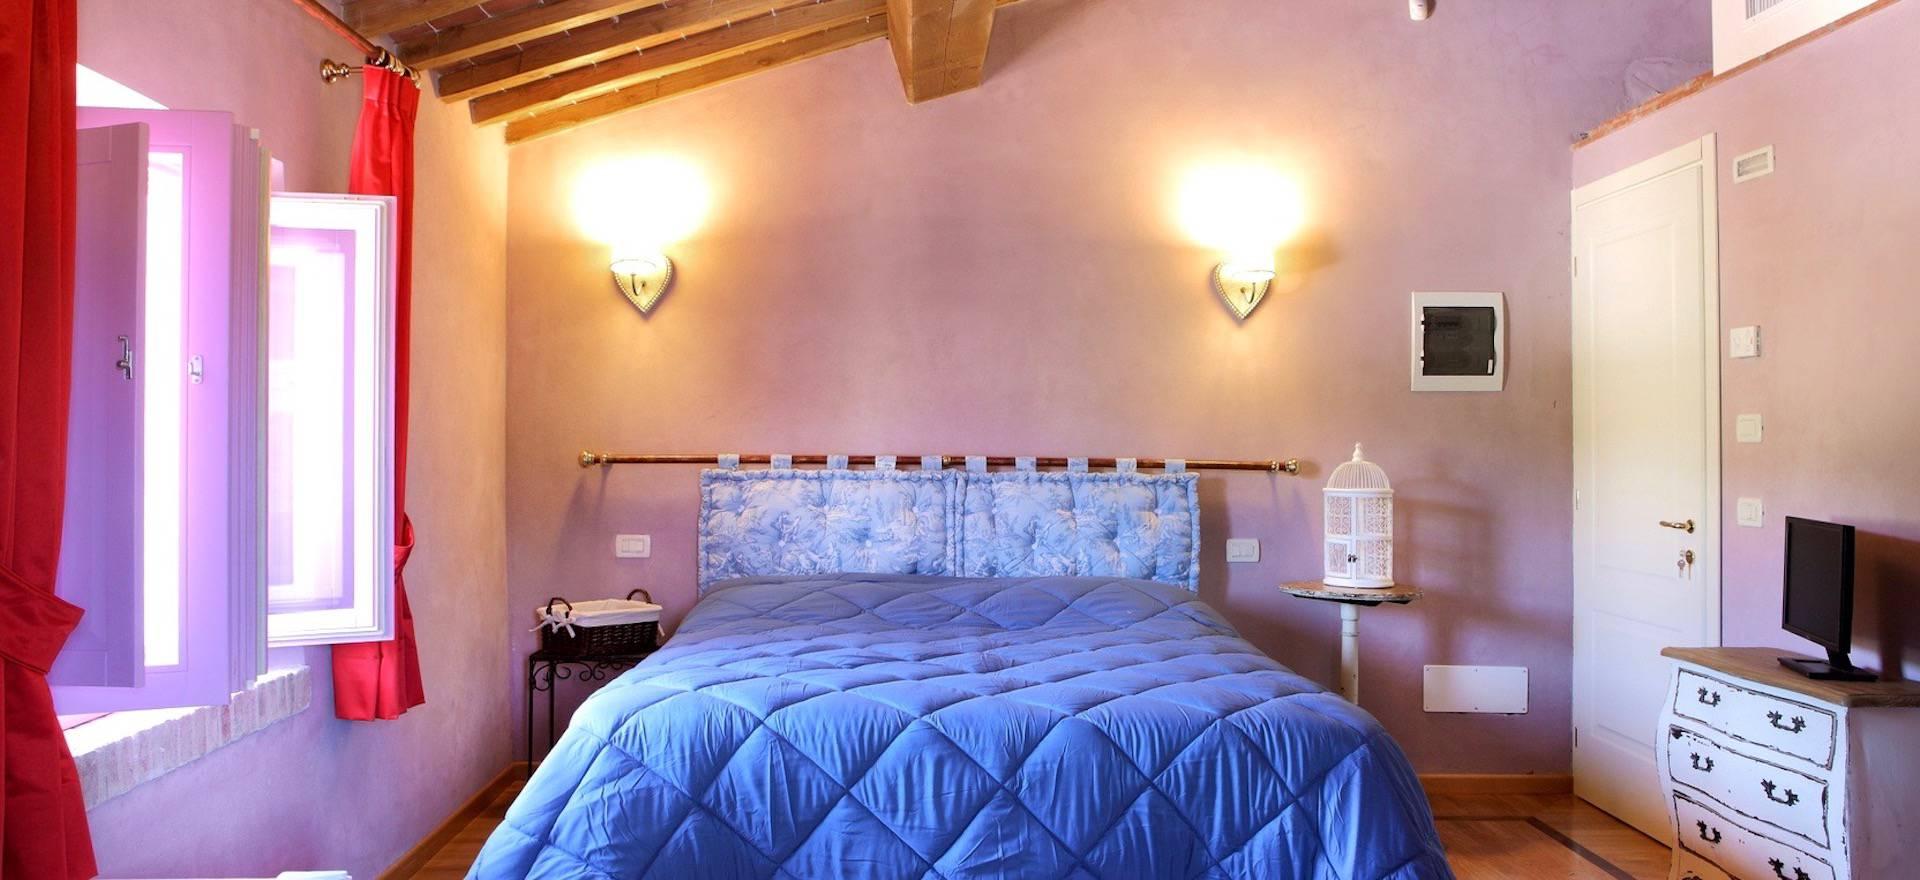 Agriturismo Toscane Zeer sfeervolle kamers in een agriturismo in Toscane